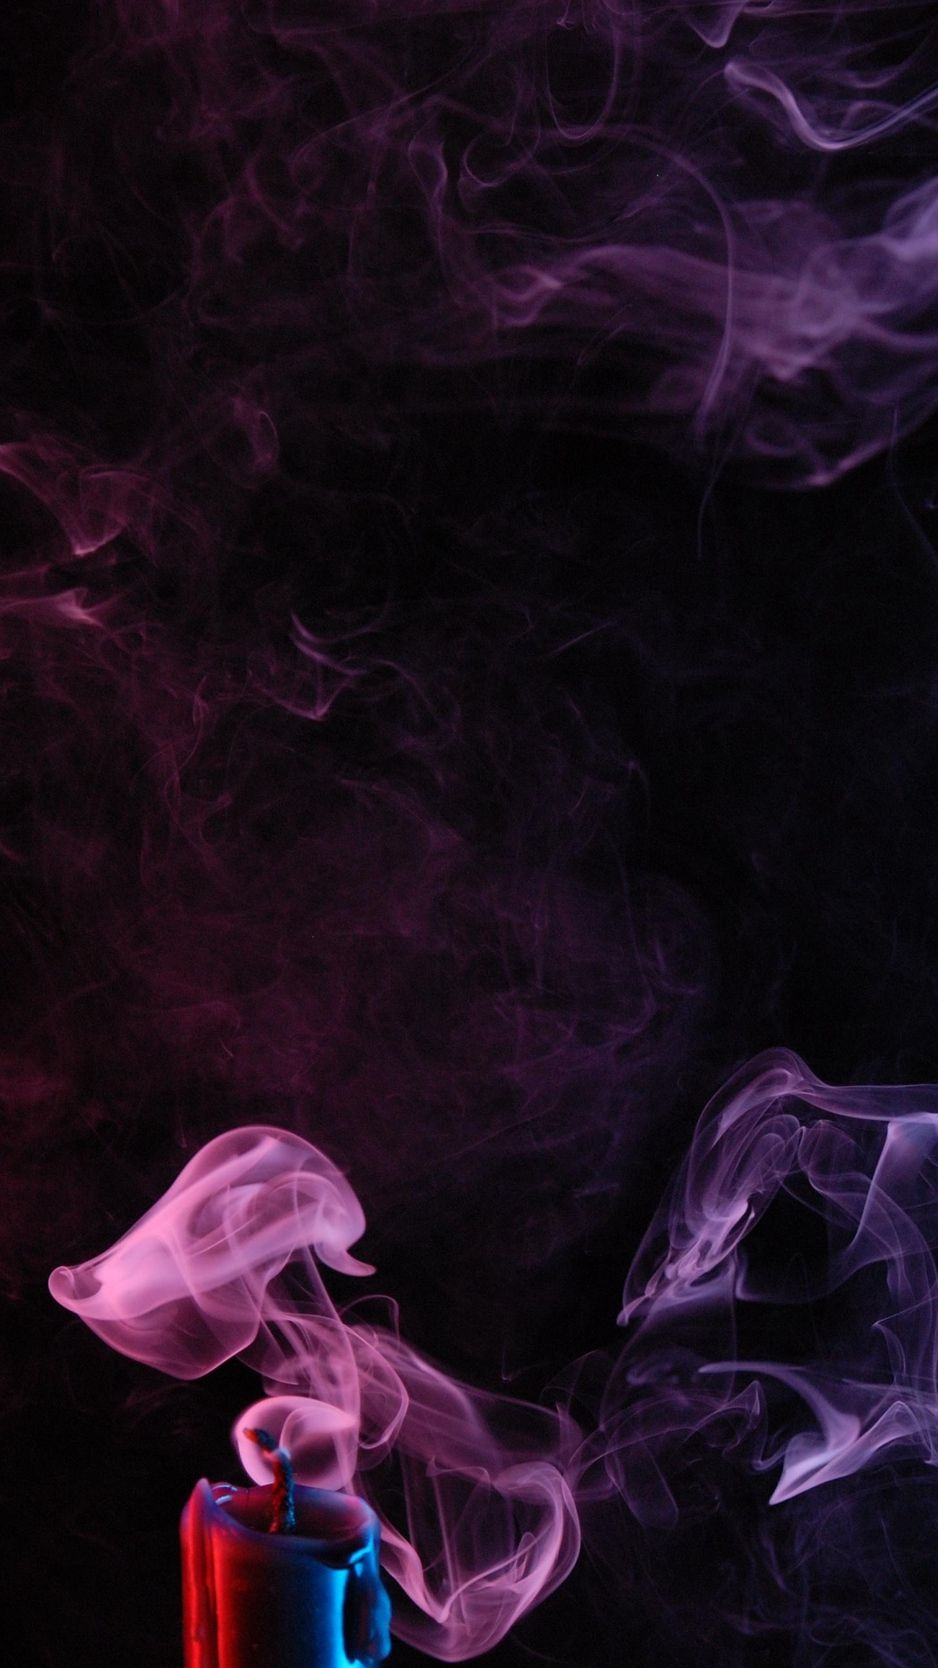 Candle Smoke Colored Smoke Wallpaper Smoke Wallpaper